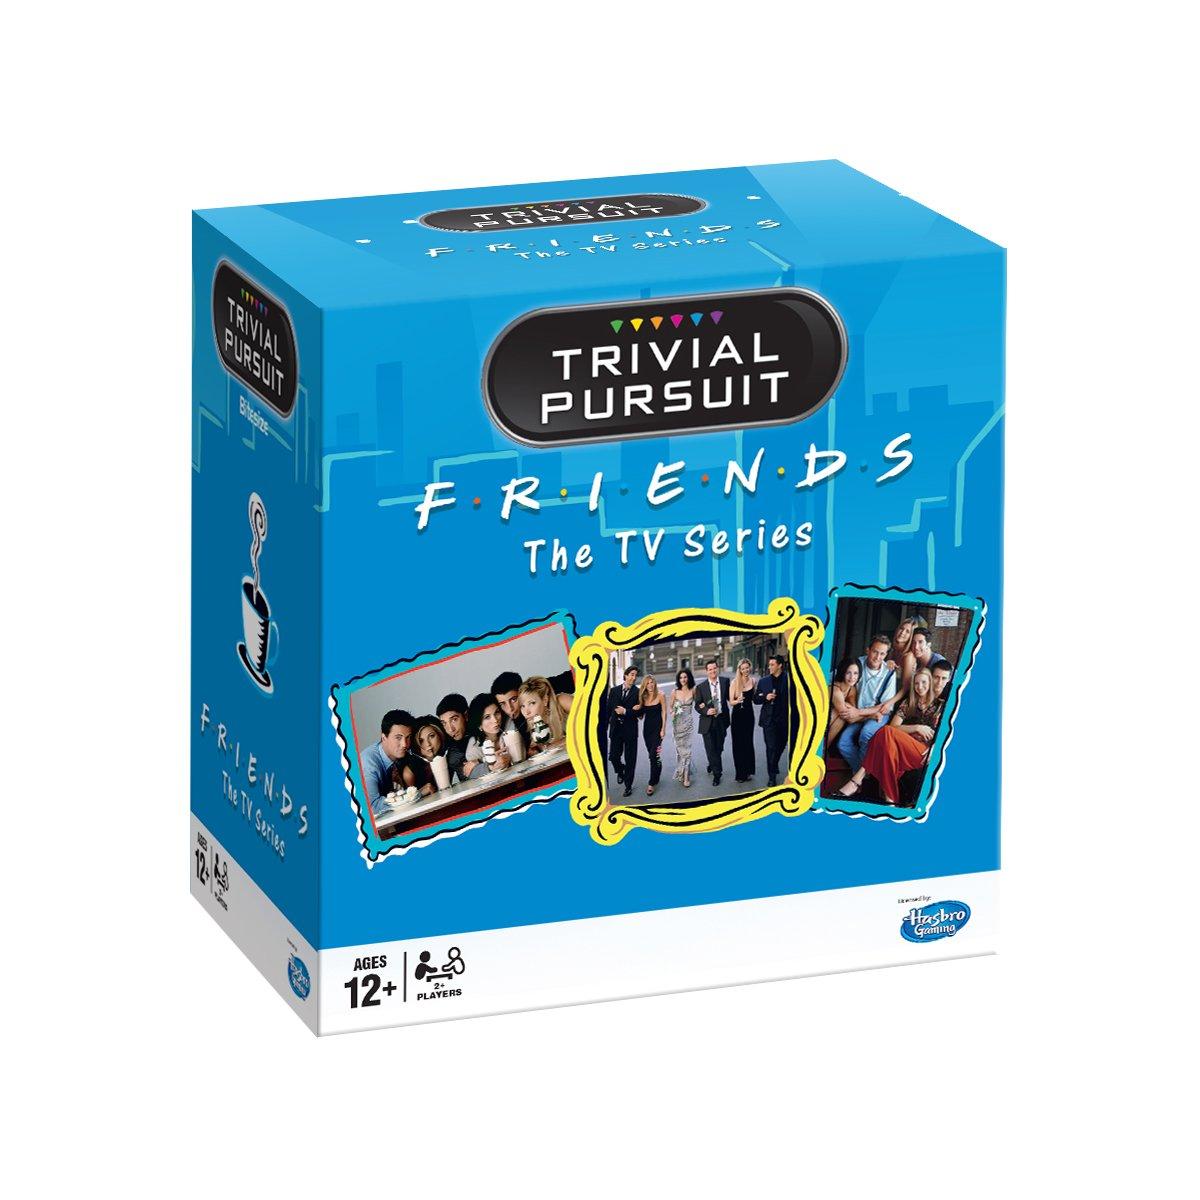 Friends Trivial Pursuit Quiz Game - Bitesize Edition Winning Moves 27342